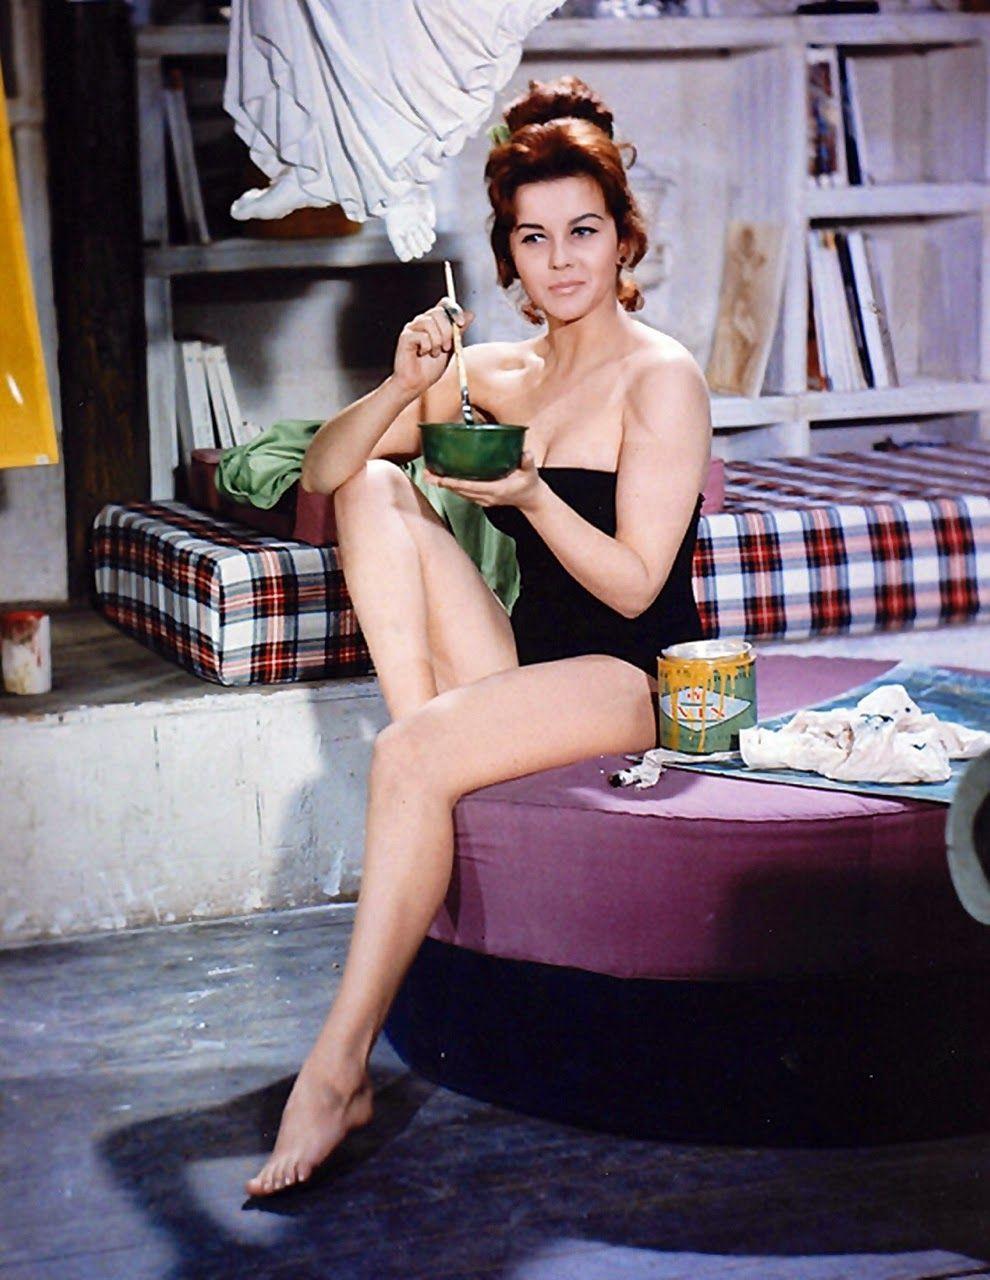 ann-margret-pictures-bikini